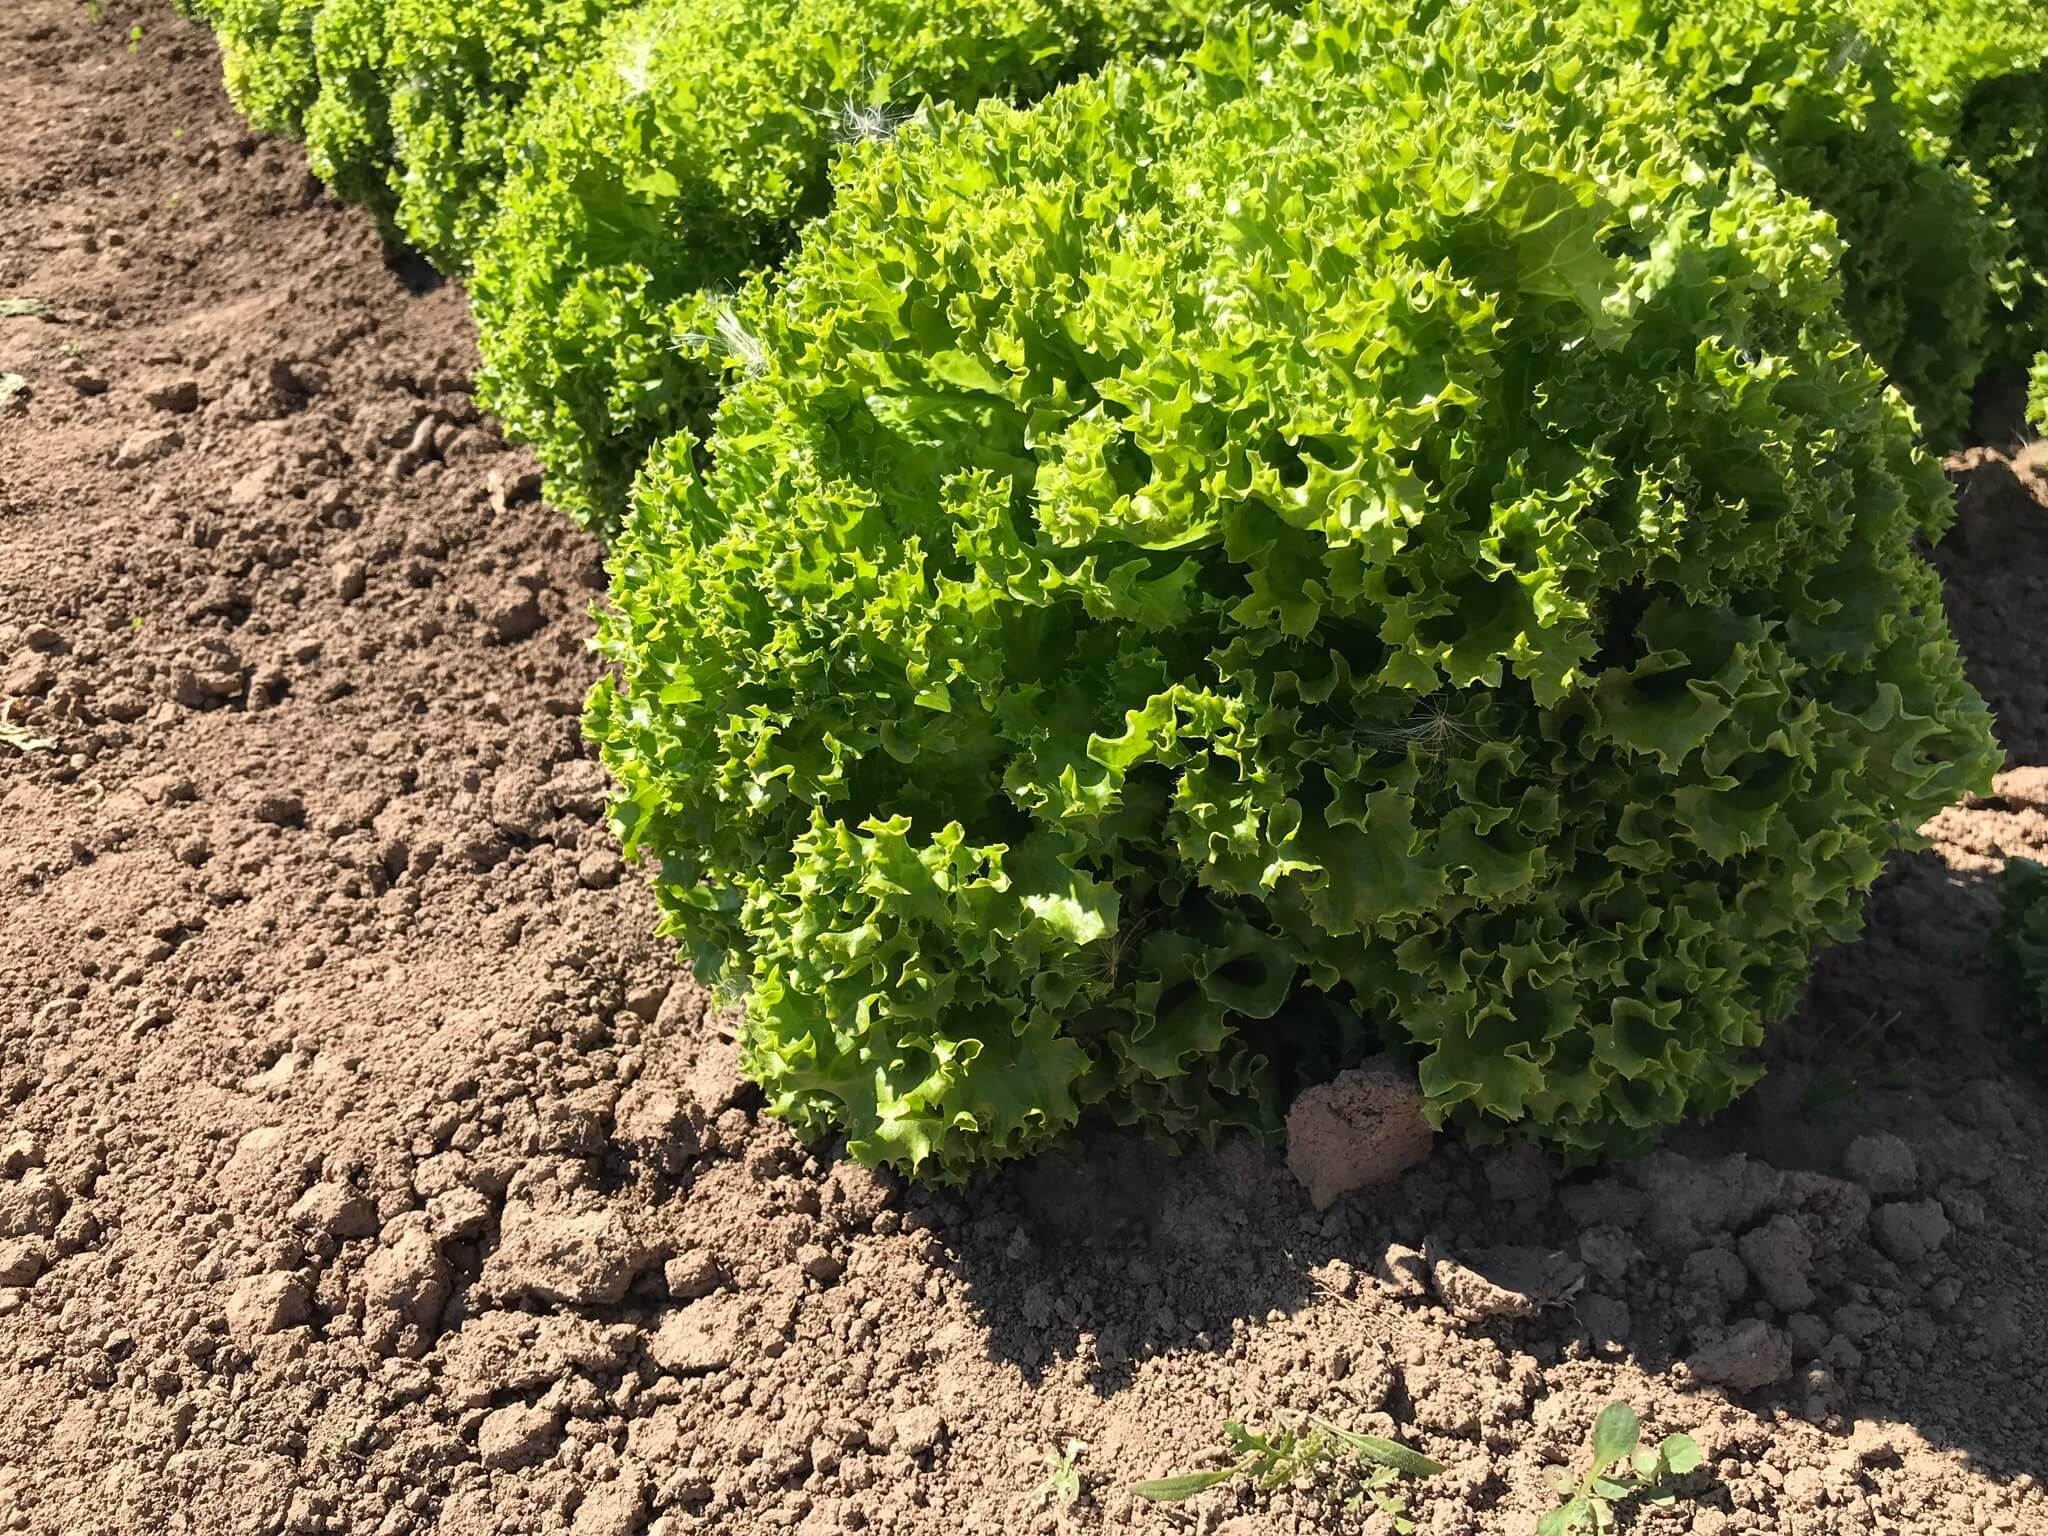 Технология выращивания салата в условиях открытого грунта от Rijk Zwaan/Райк Цваан